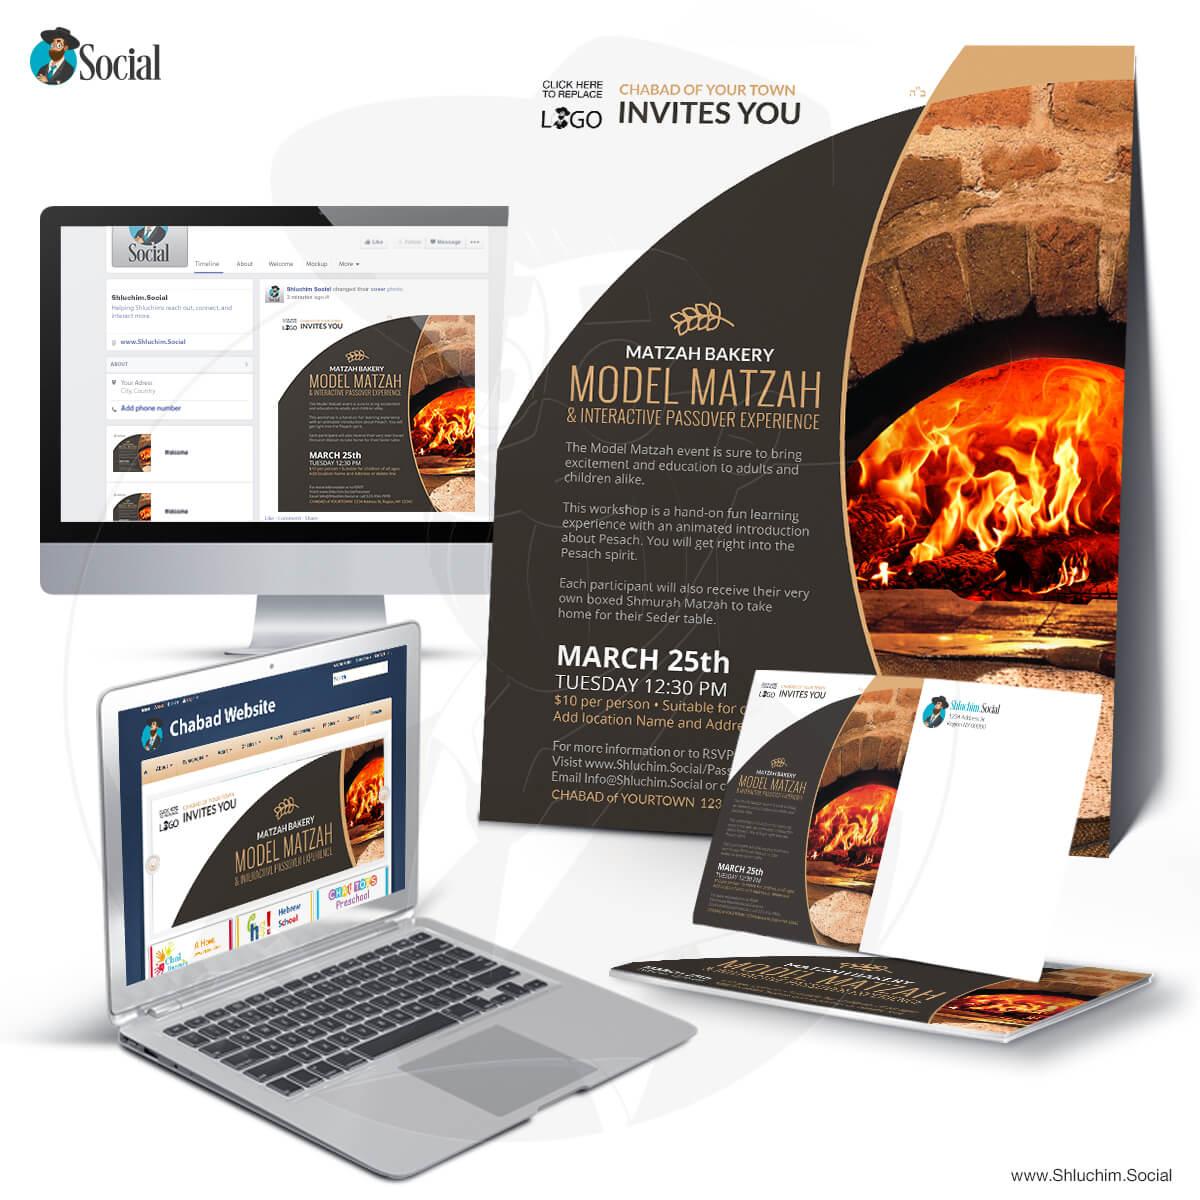 Matzah Bakery- Model and Interactive